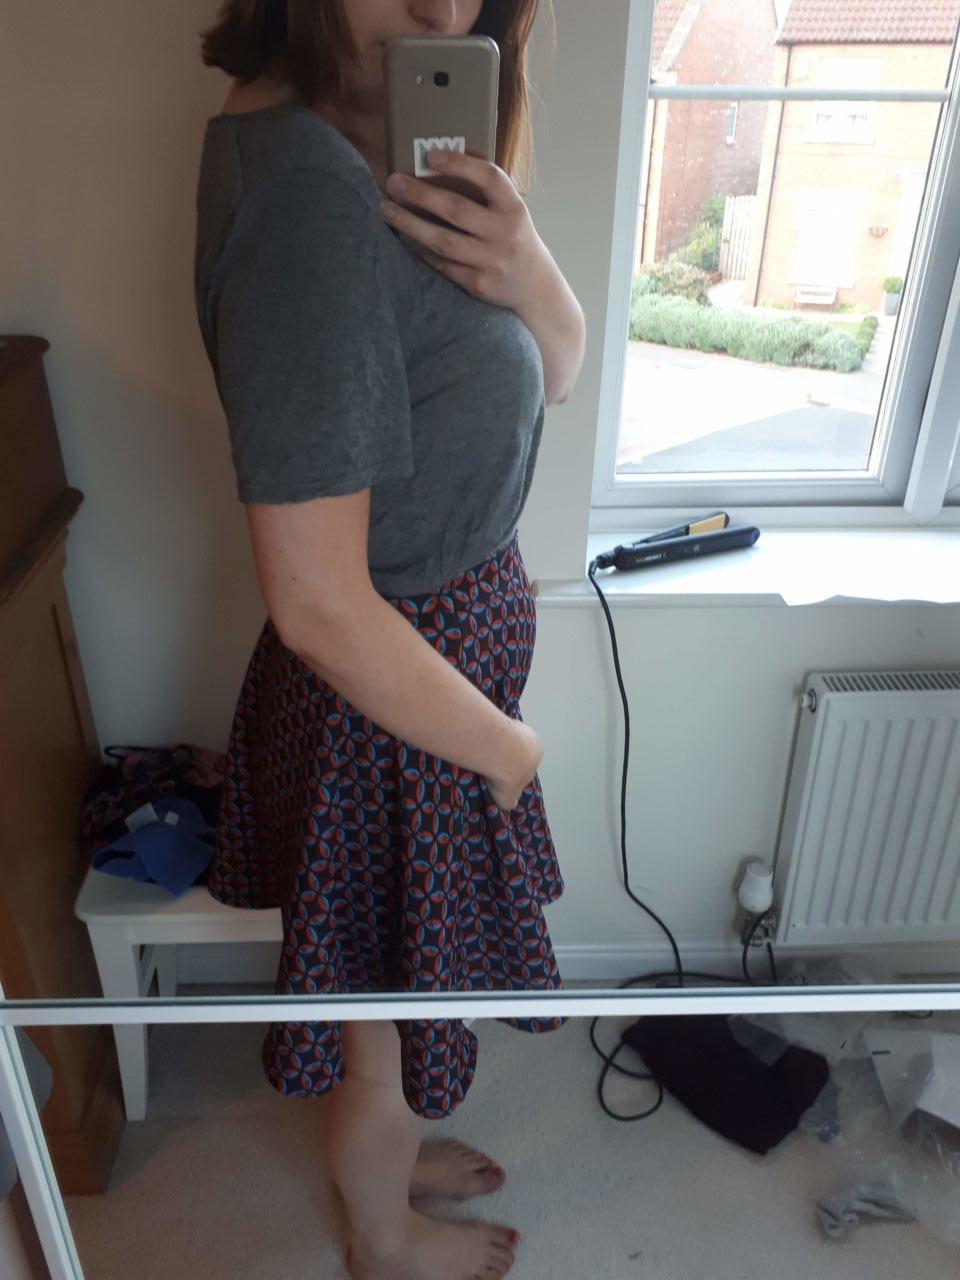 Week 7 pregnancy diary - bump or bloat?